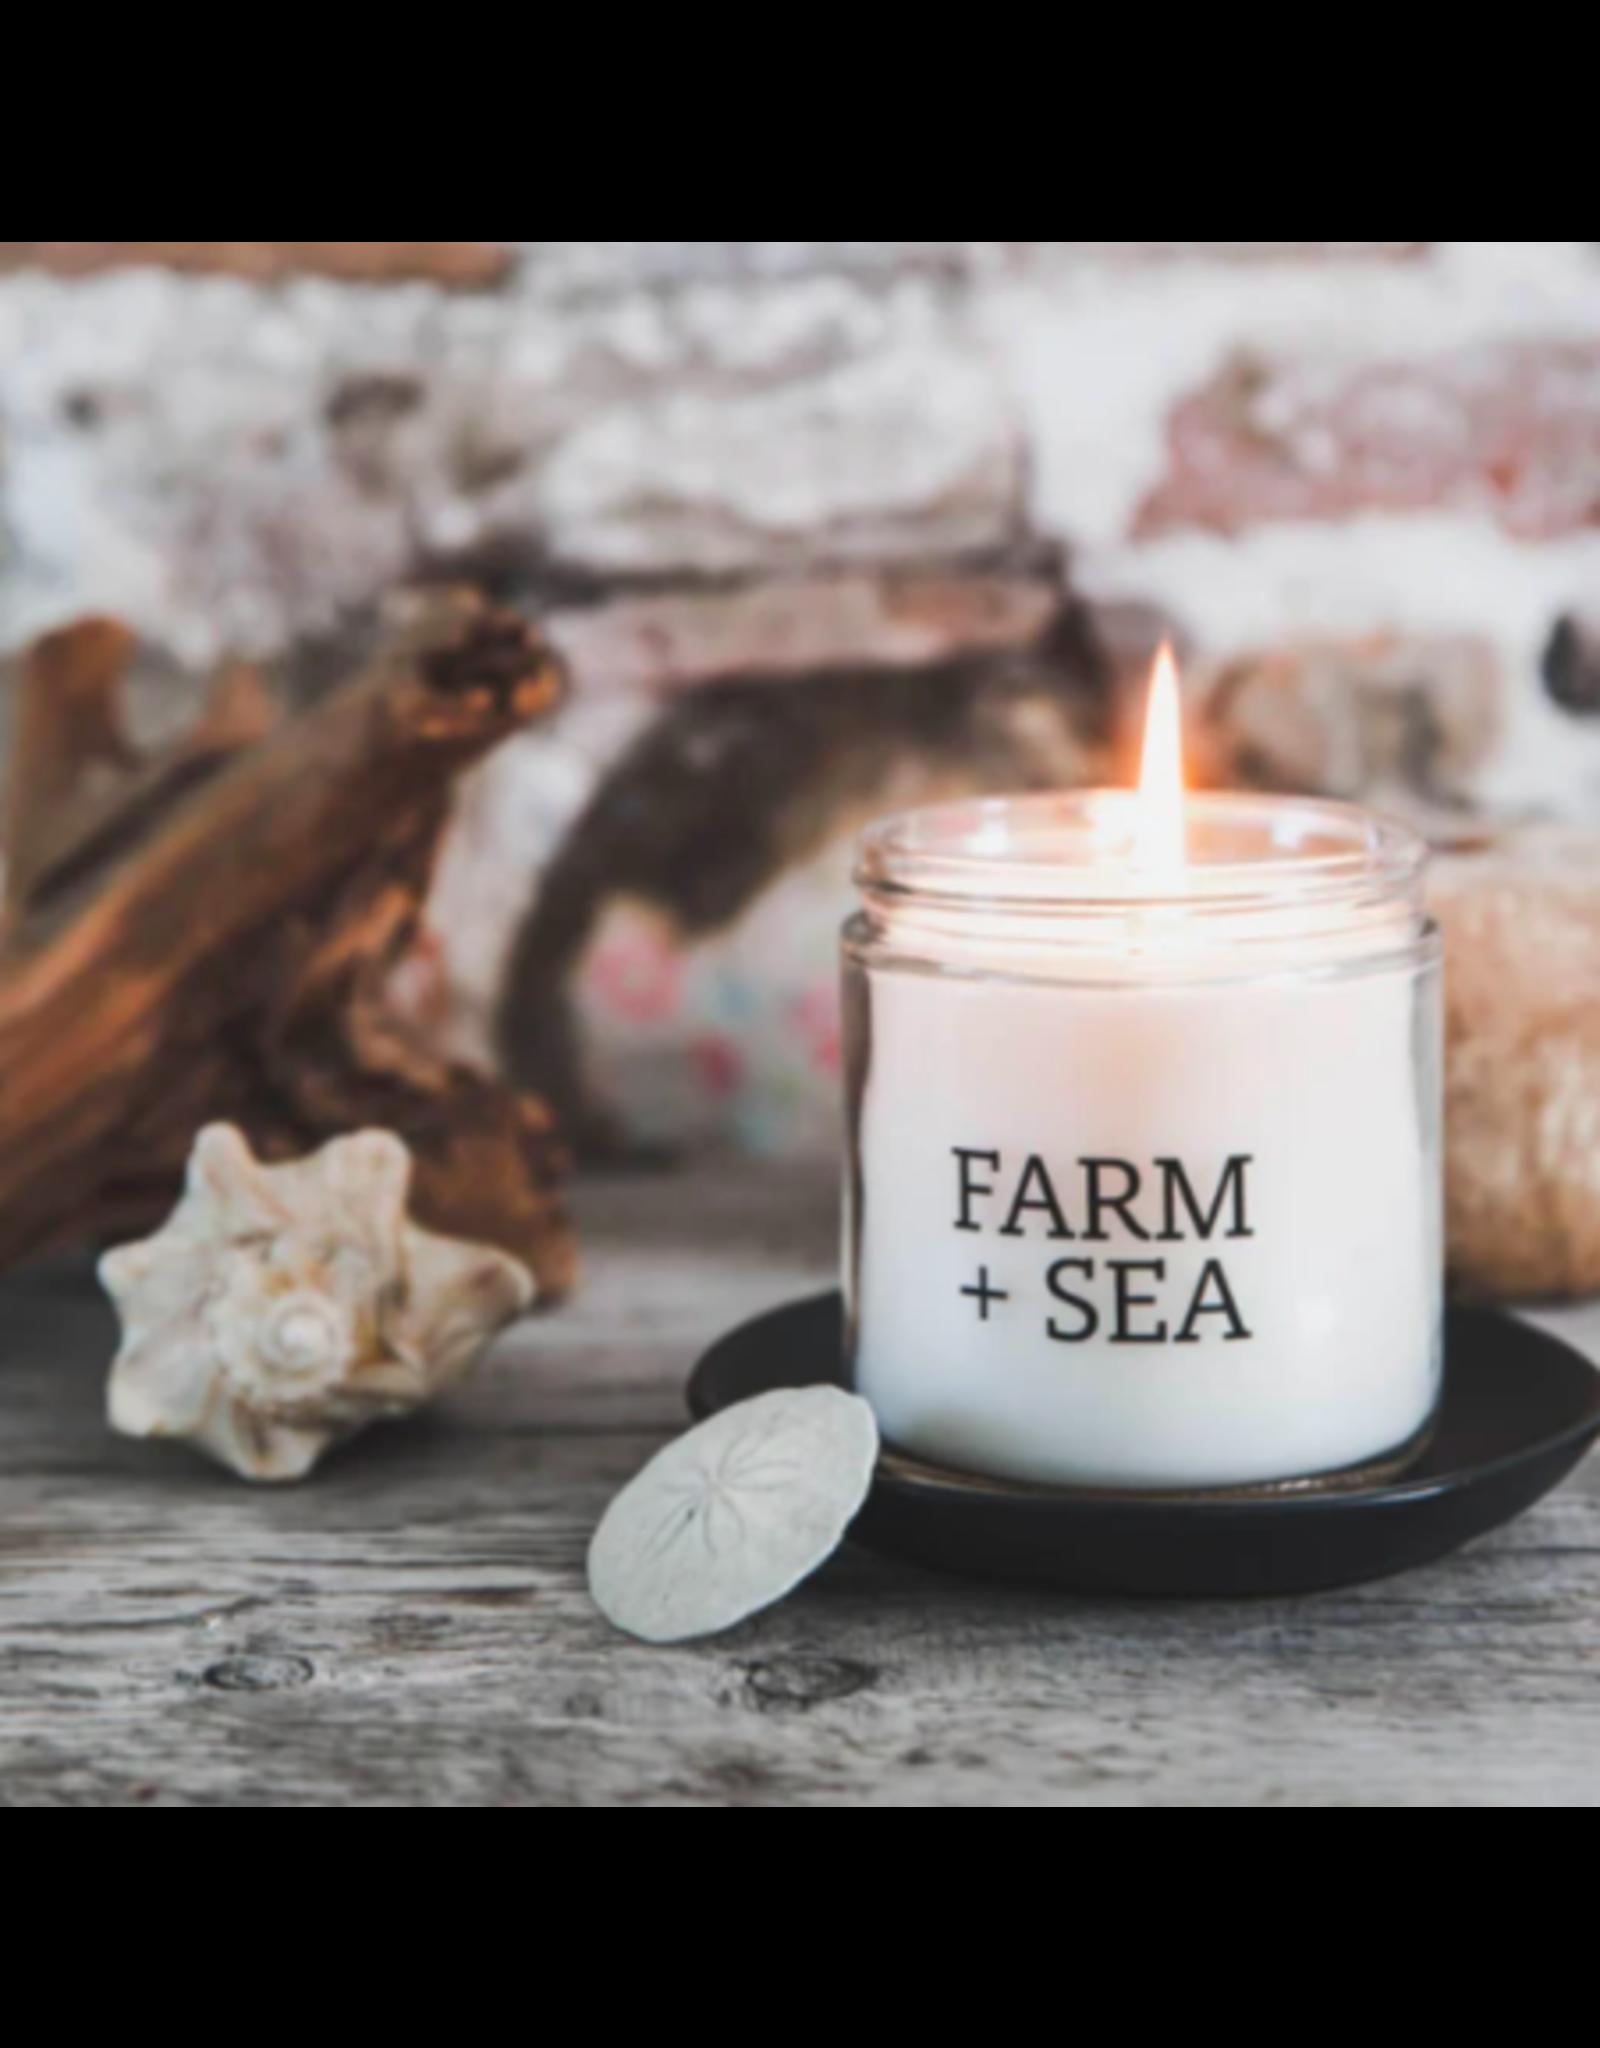 Farm + Sea White Peach Large Candle by Farm + Sea